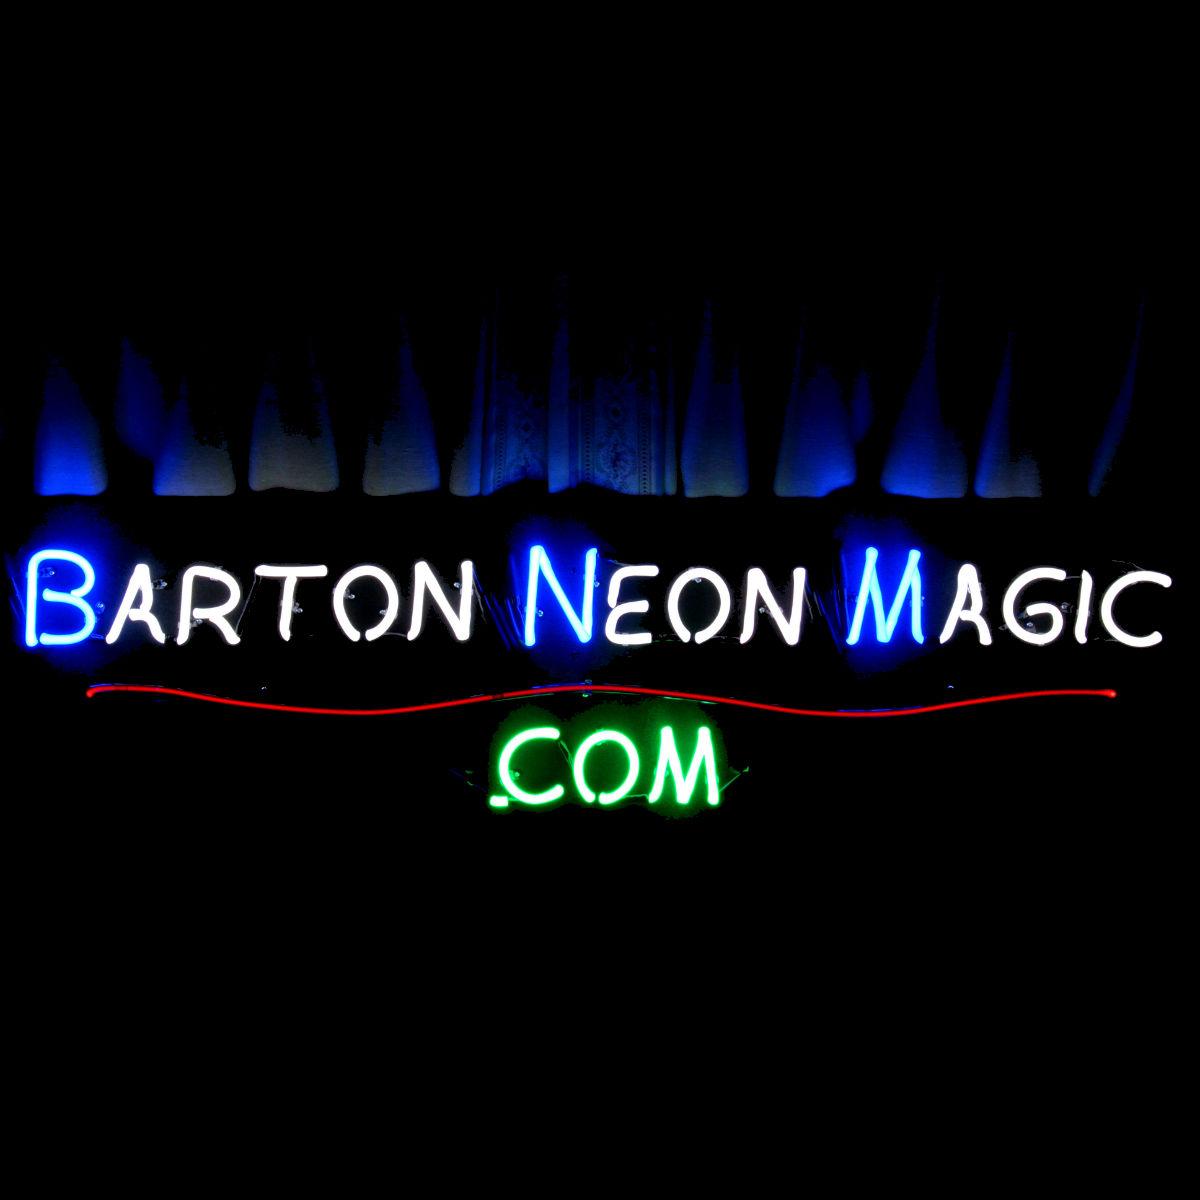 Custom Hand-blown Neon by John Barton - Famous American Neon Light Sculptor